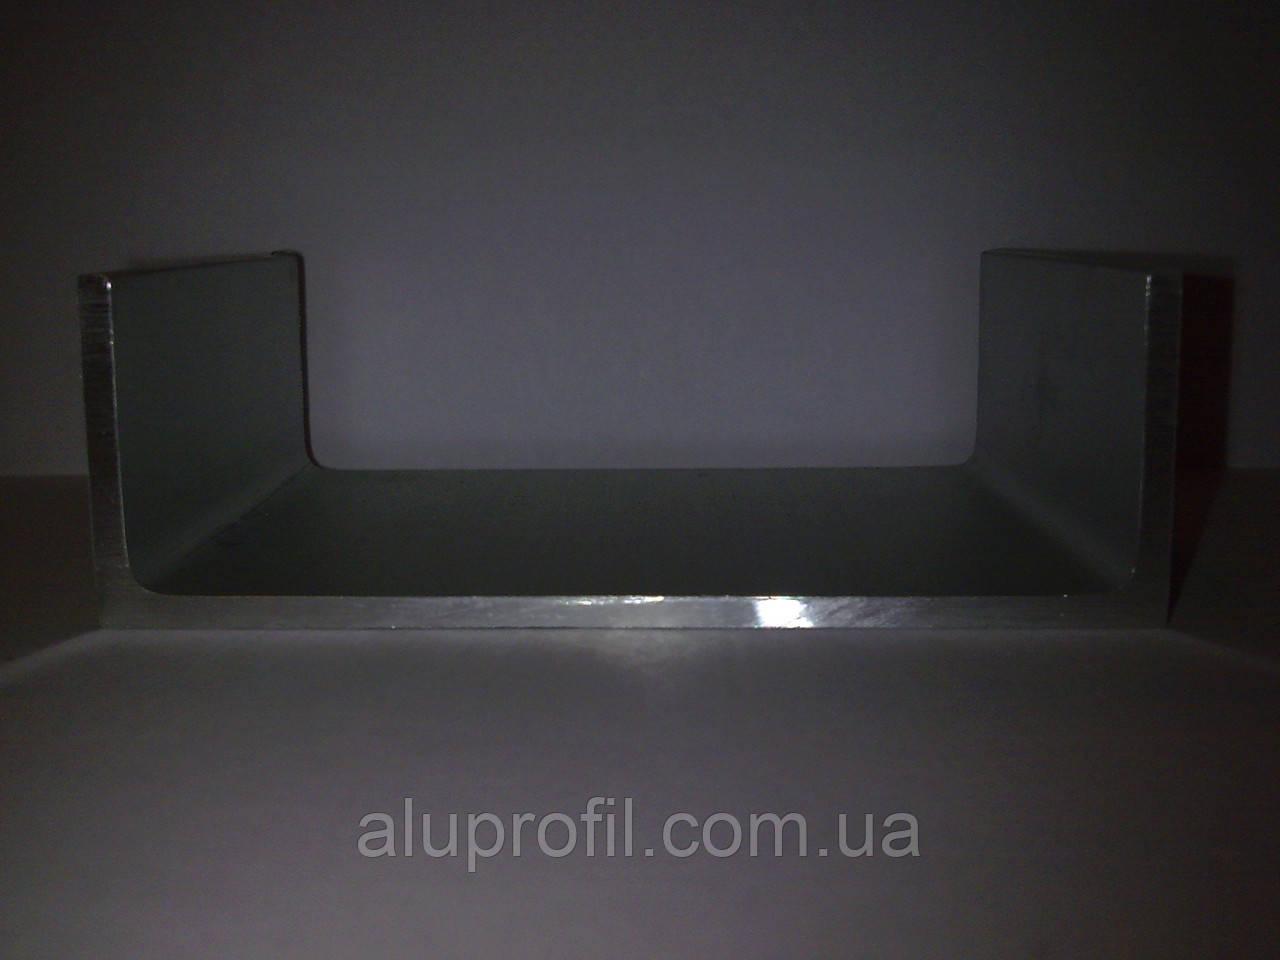 Алюминиевый профиль — п-образный алюминиевый профиль (швеллер) 70х25x3 Б/П